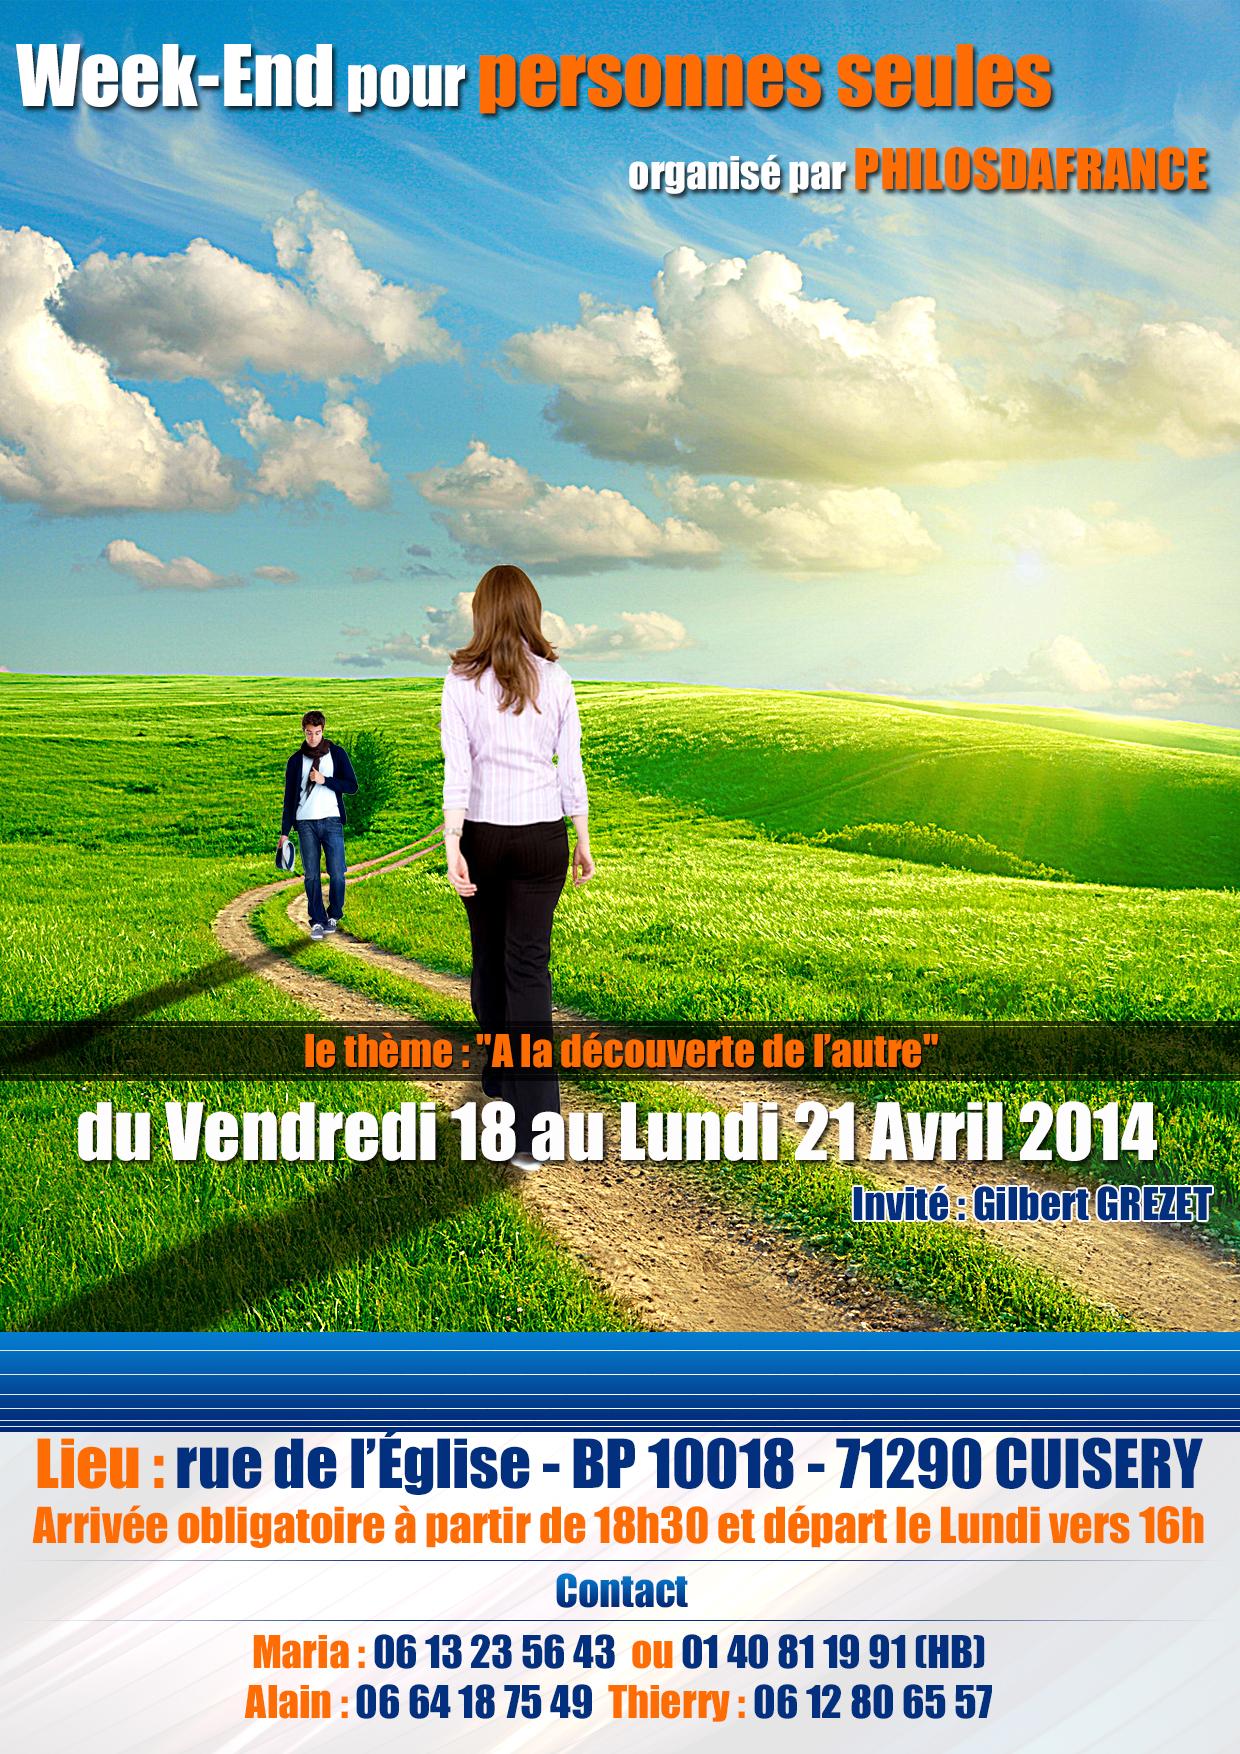 Cherche un femme clarence-rockland group footer fr